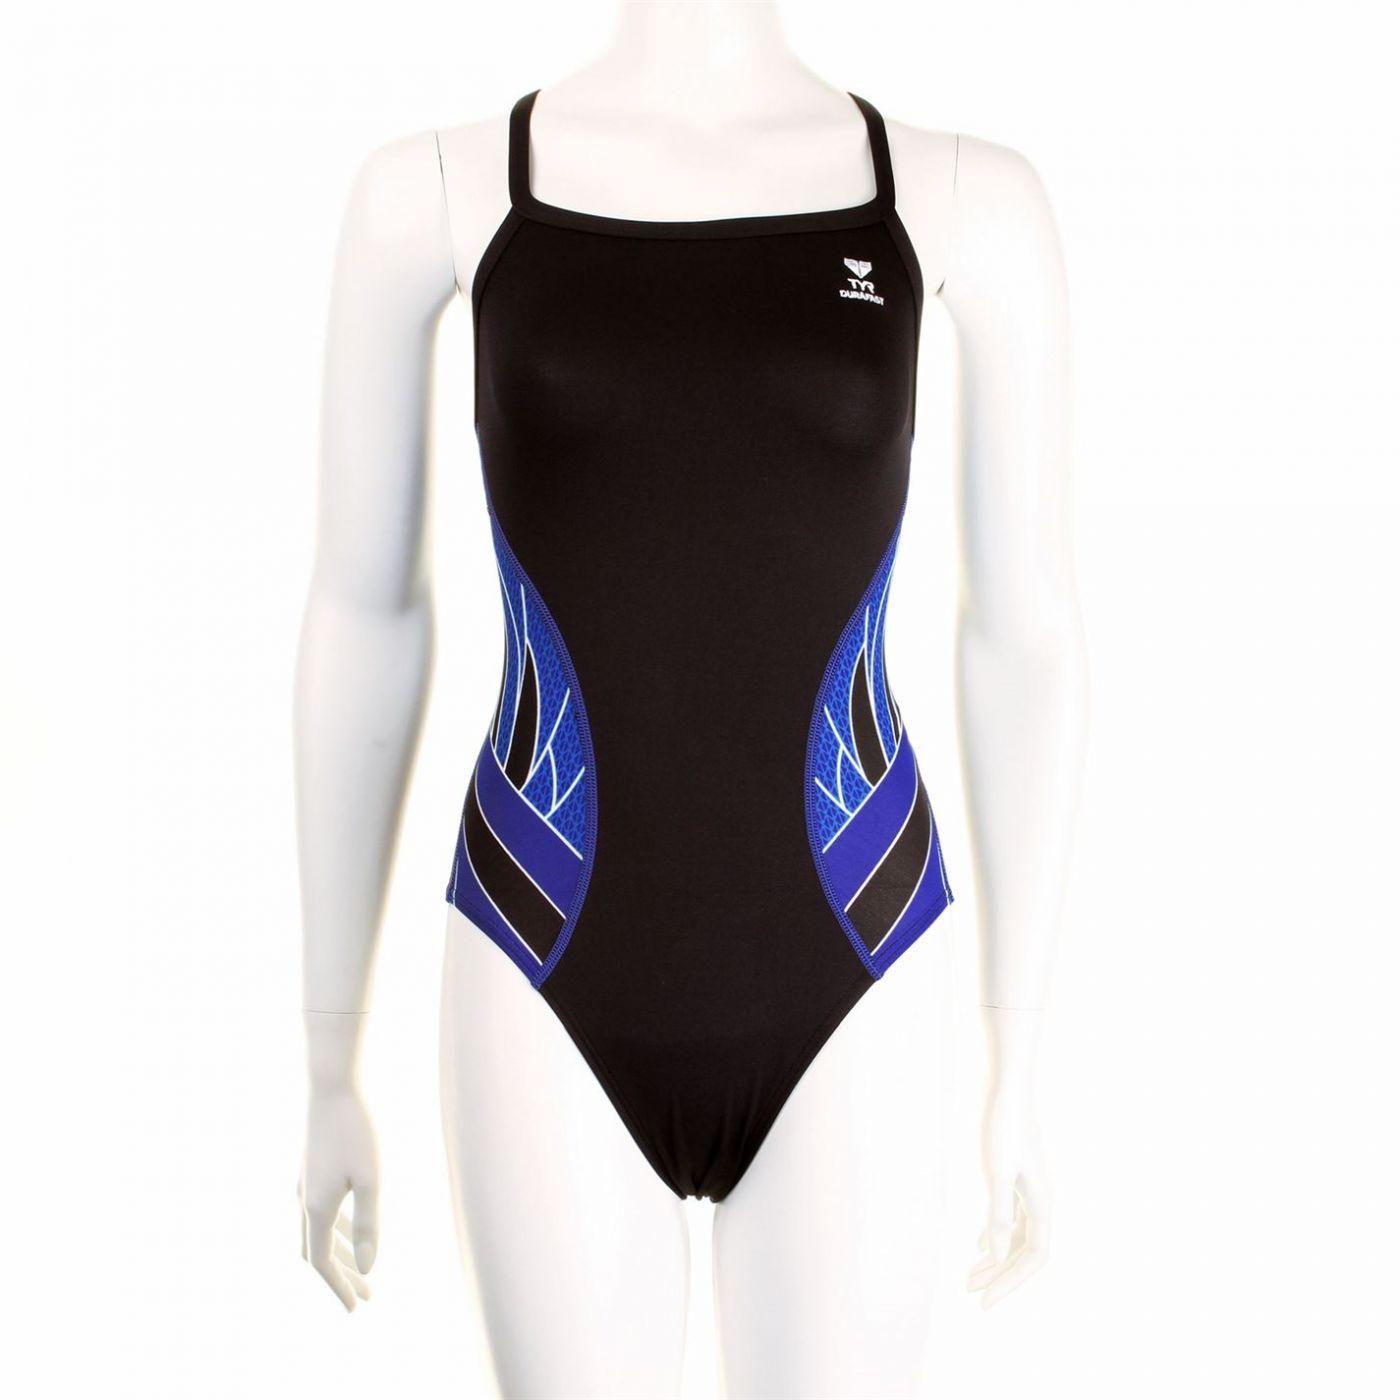 5e5b89b9ff Prodej skončil - Tyr Phoenix Swimsuit Ladies